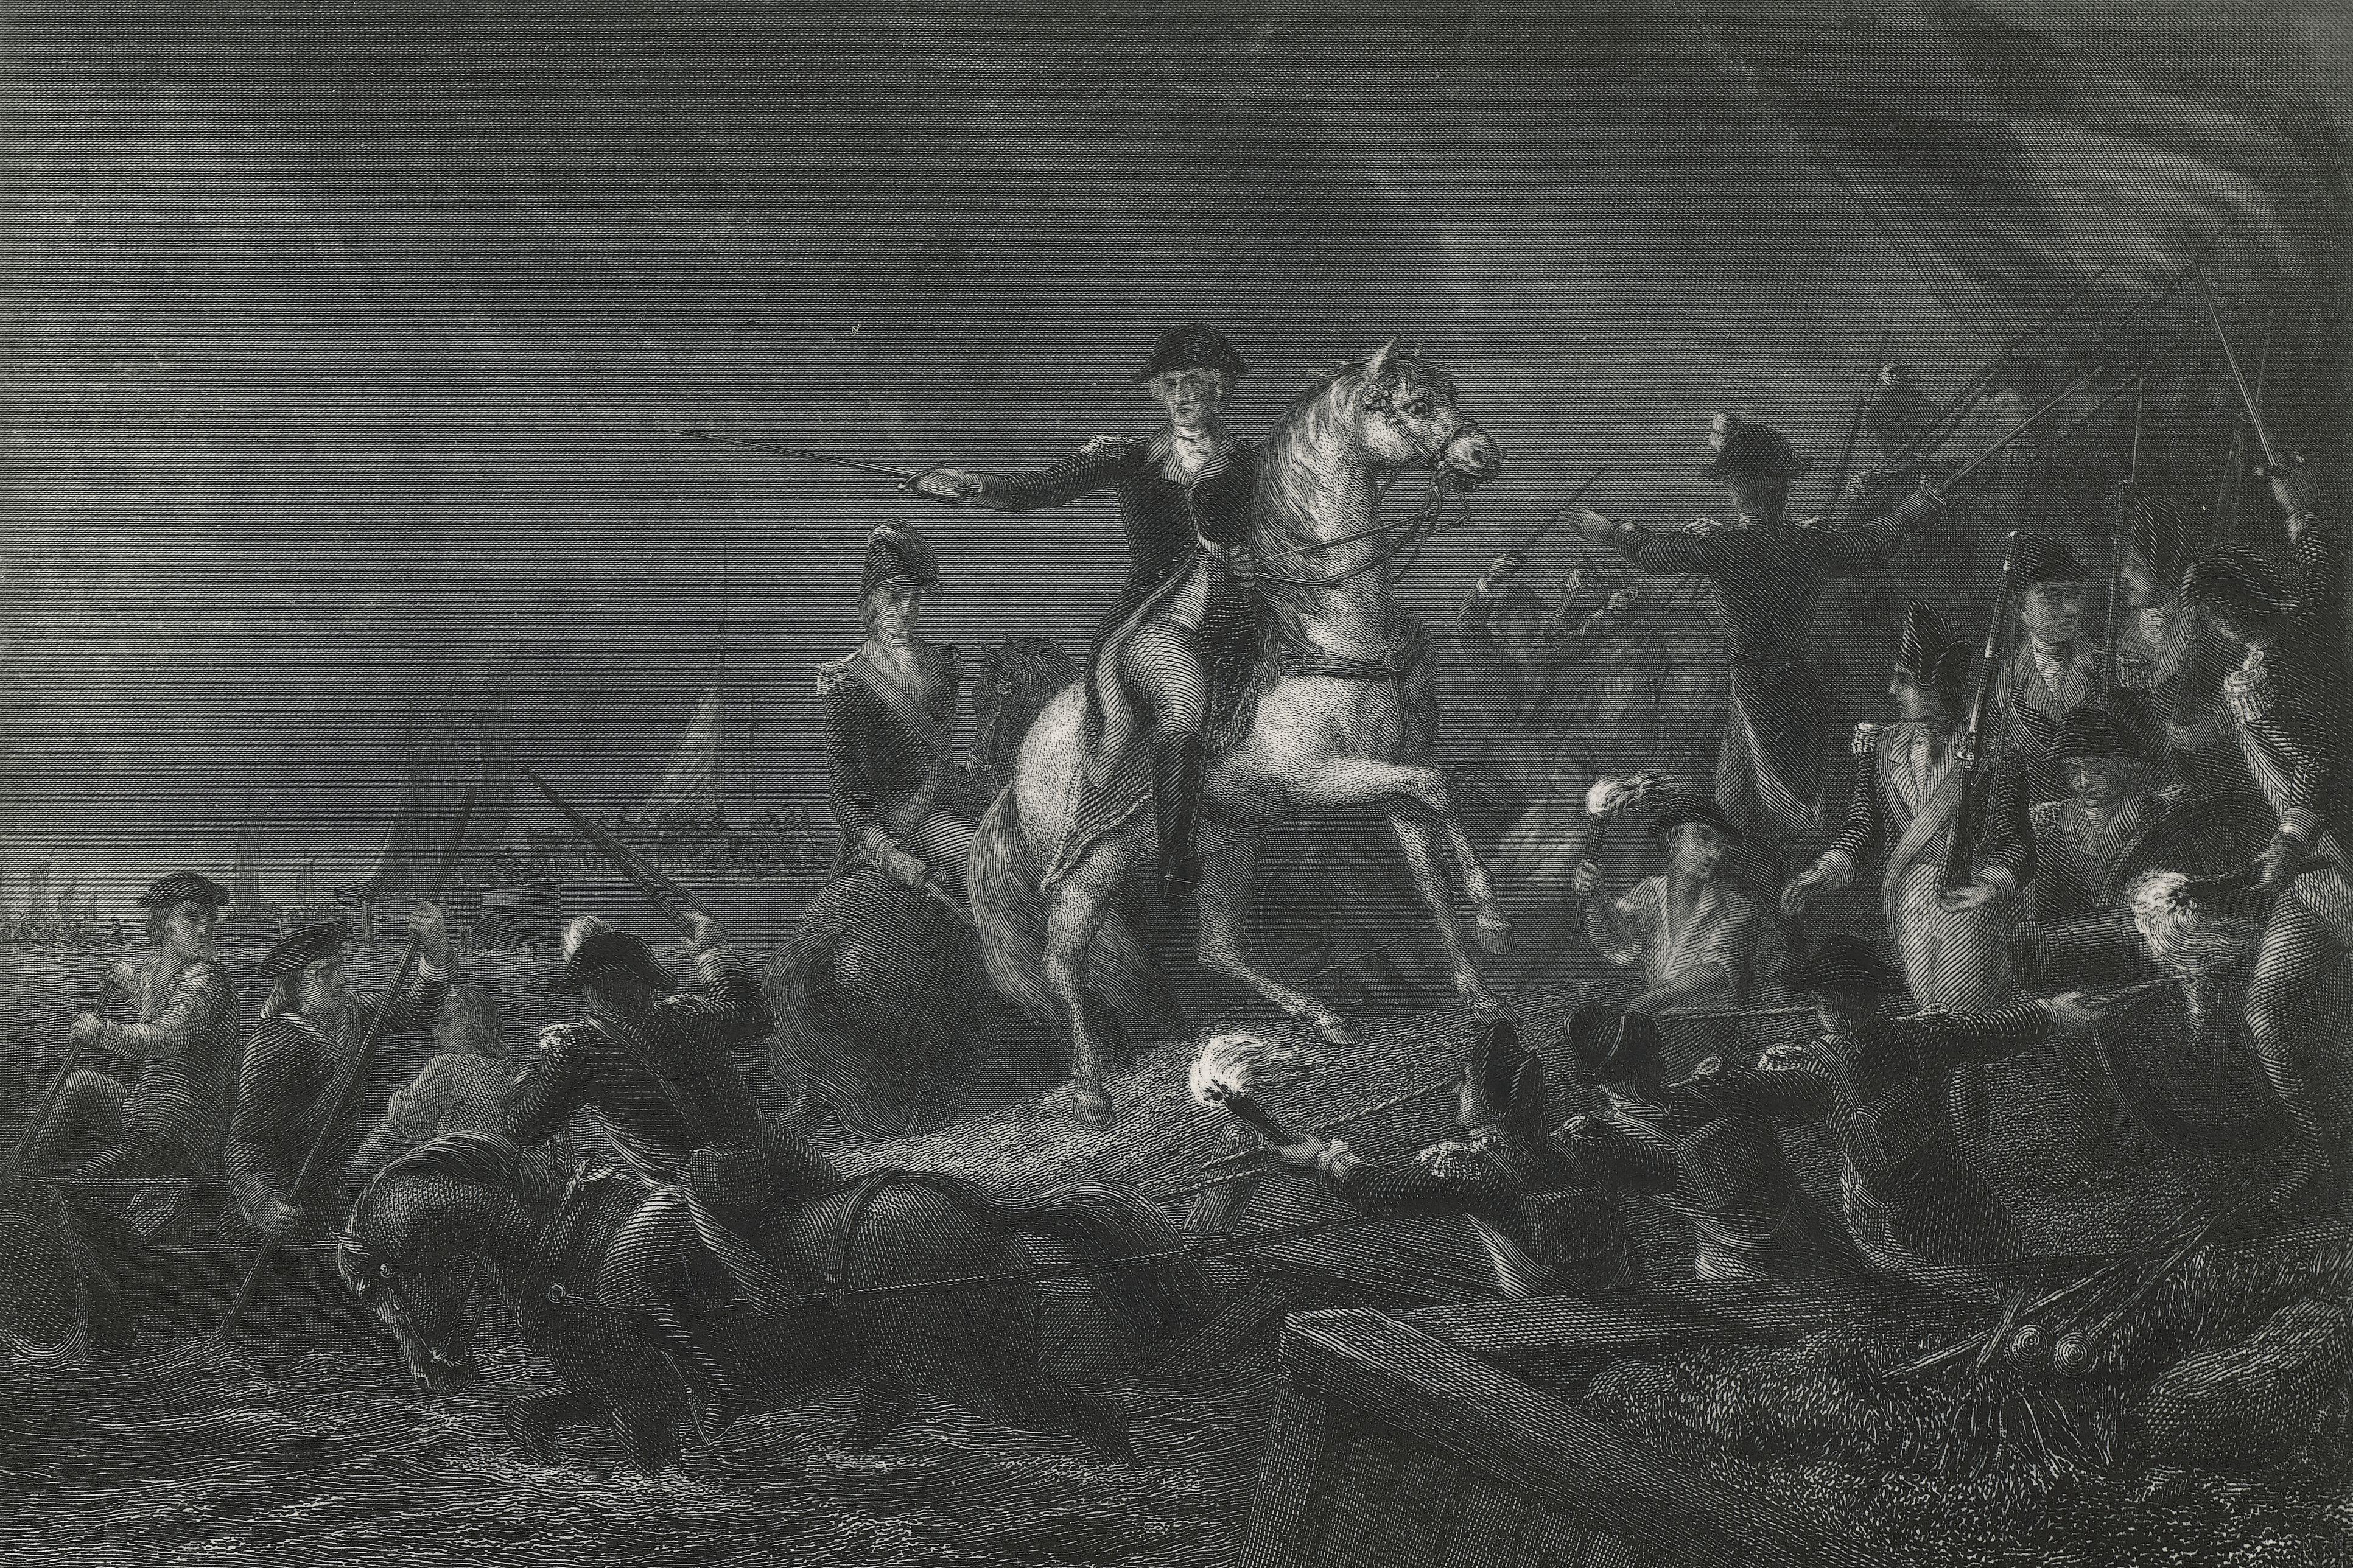 George Washingtons retreat to Long Island, August 27, 1776, American Revolutionary War, United States of America, 18th century